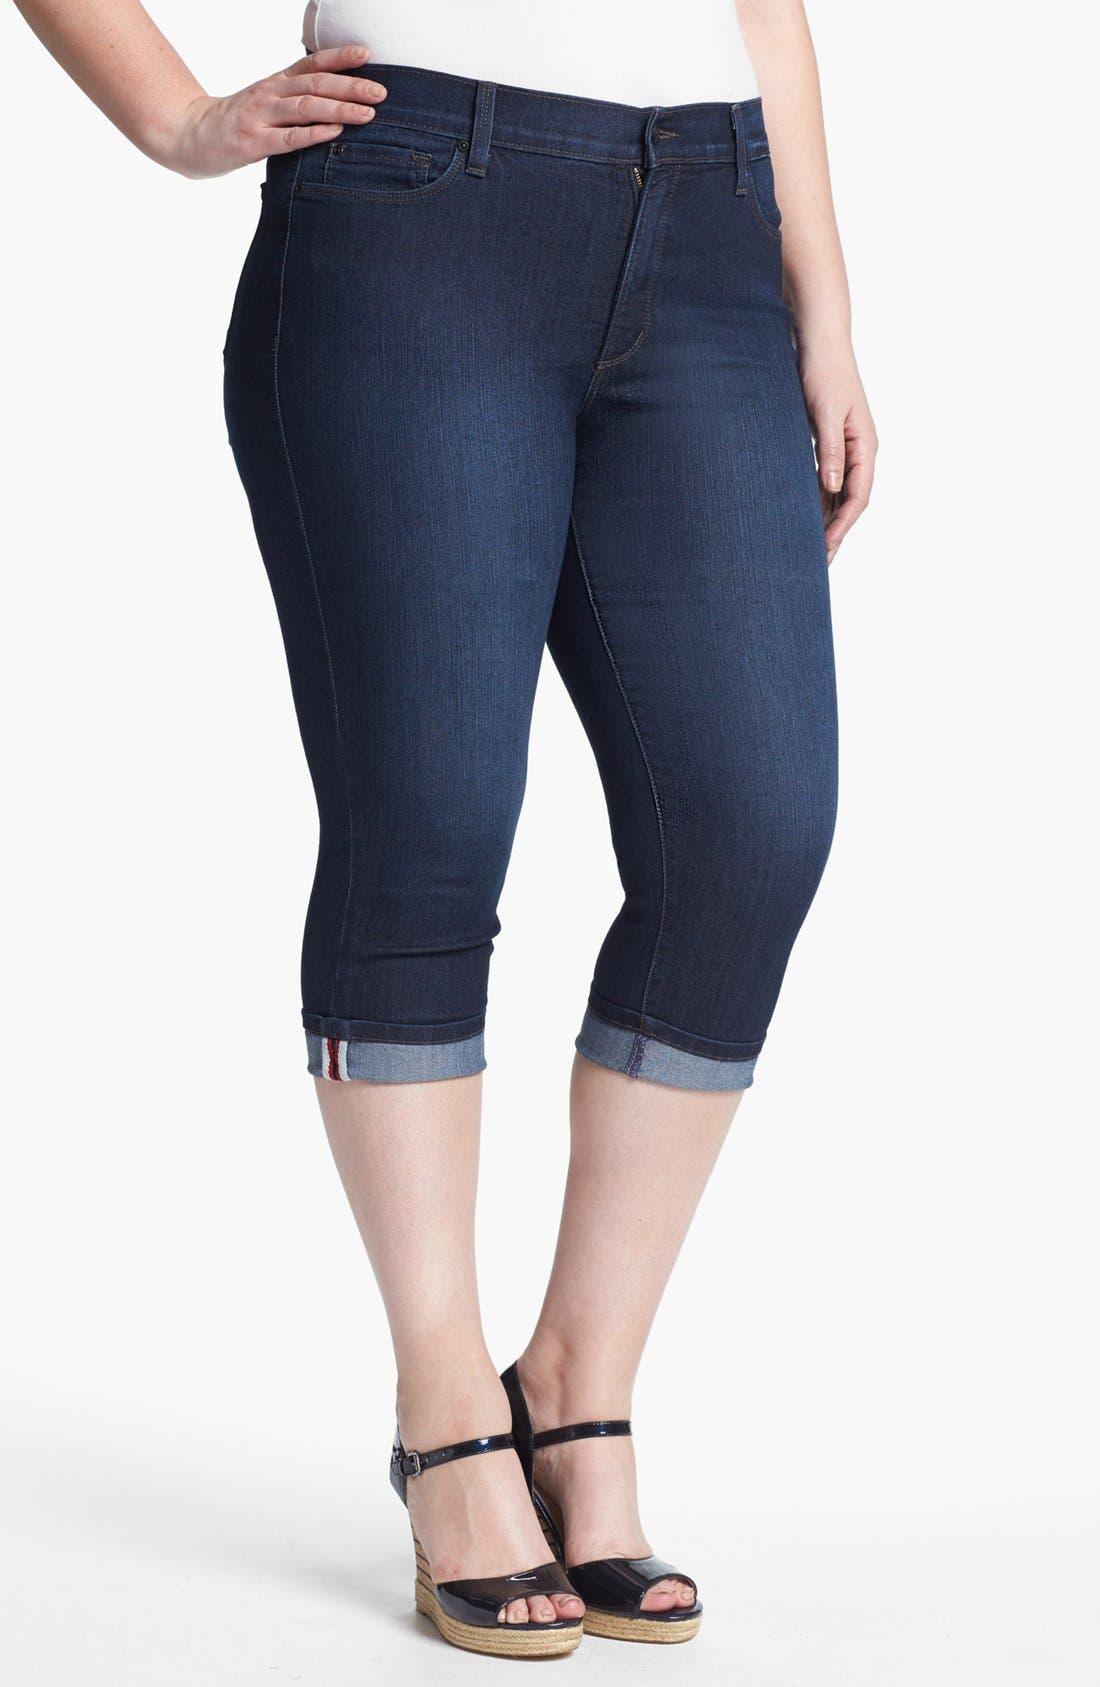 Main Image - NYDJ 'Edna' Cuff Crop Jeans (Plus Size)